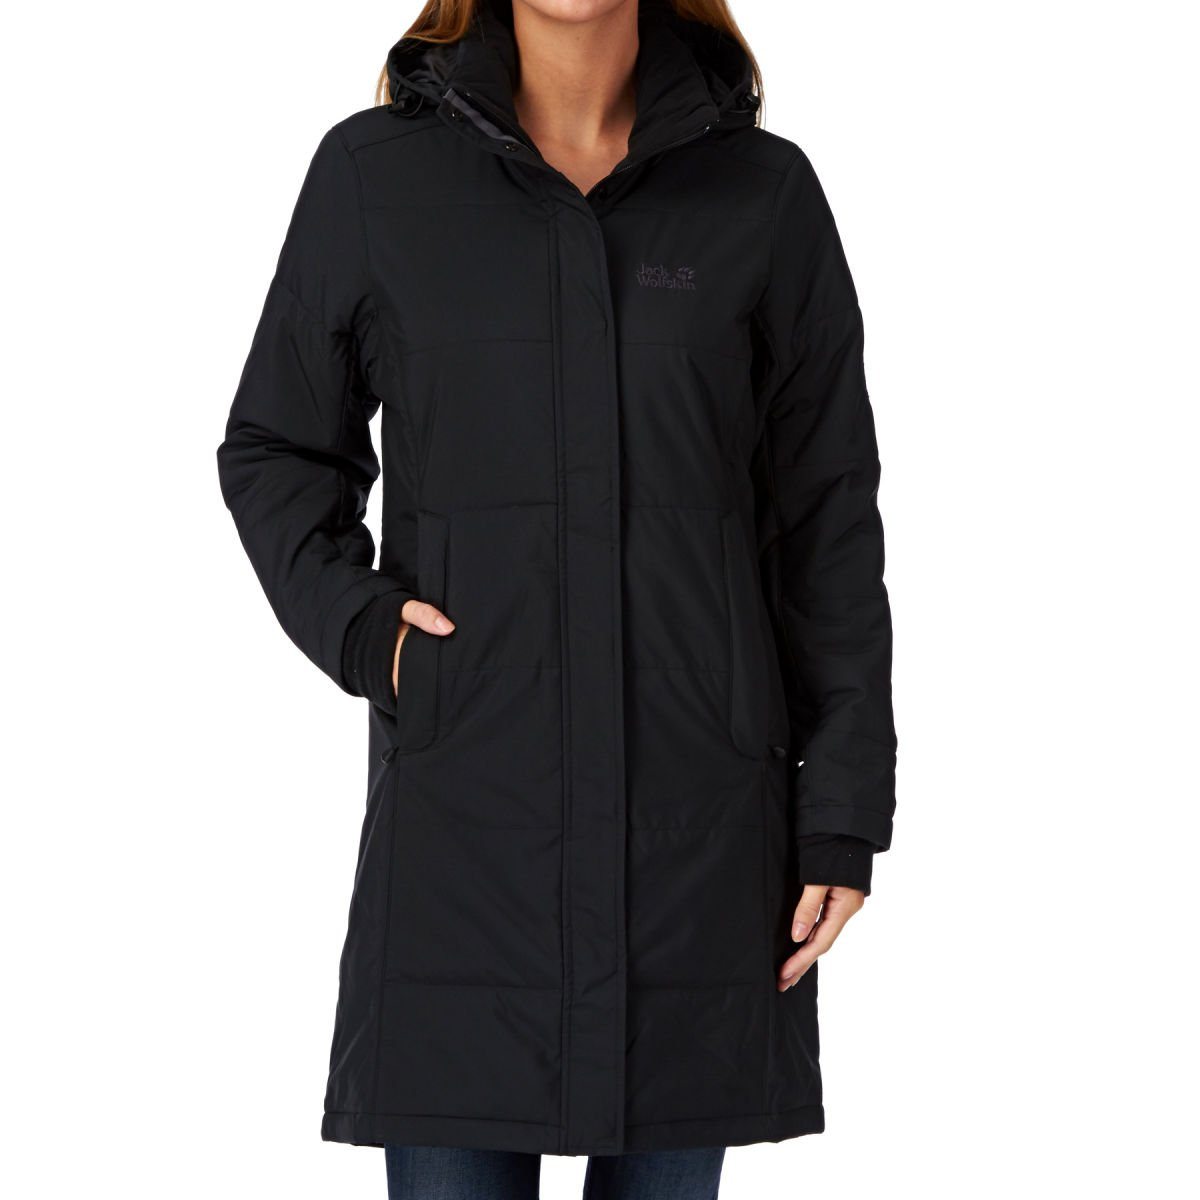 Jack Wolfskin Damen Jacke Iceguard Coat günstig bestellen